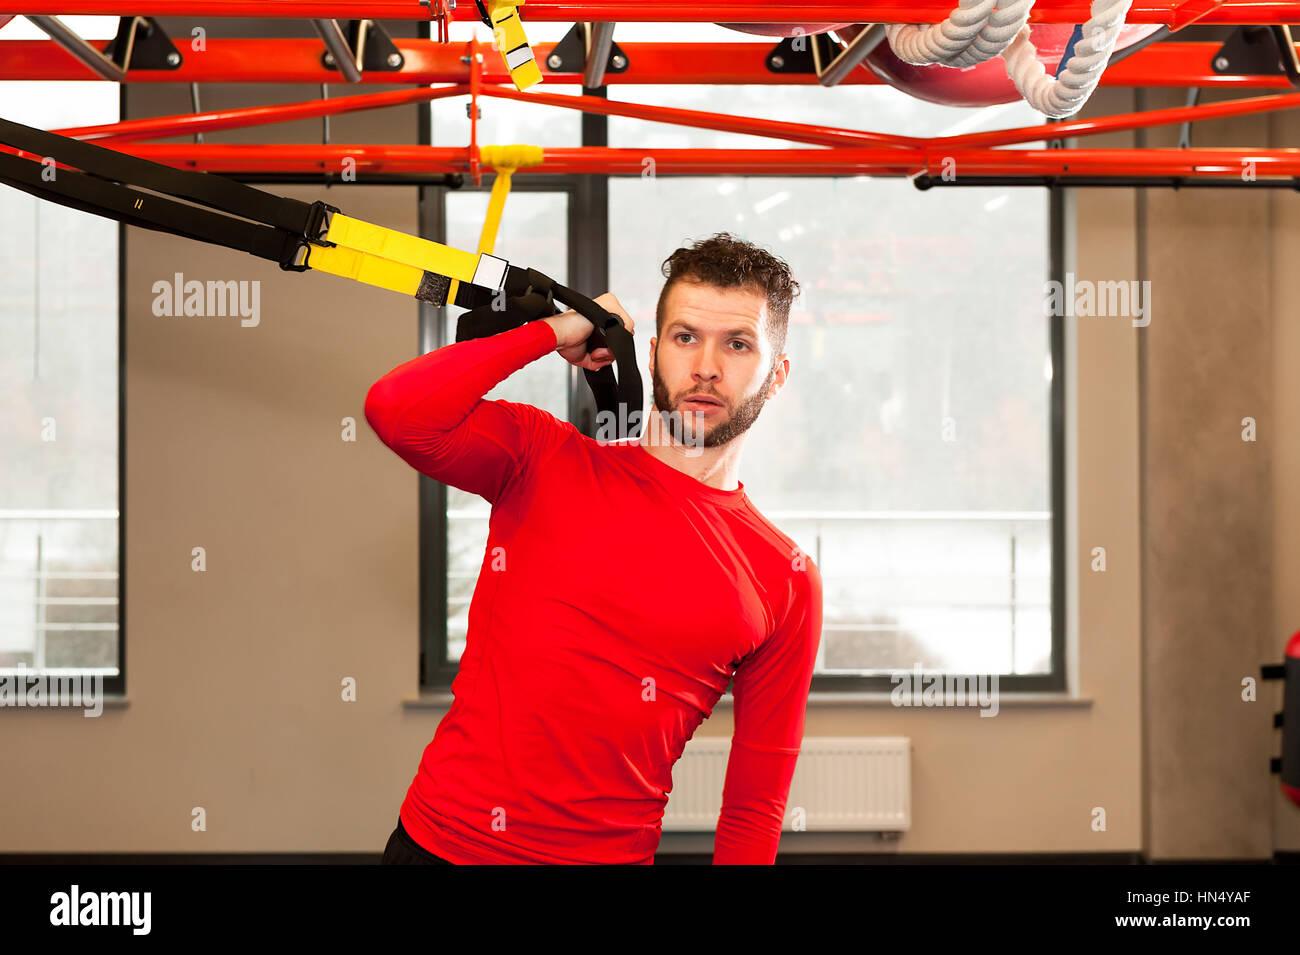 TRX Training. CrossFit Lehrer in der Turnhalle TRX-Bewegung zu tun. Fitnesstraining Mann an den Ringen. Fitness Stockbild